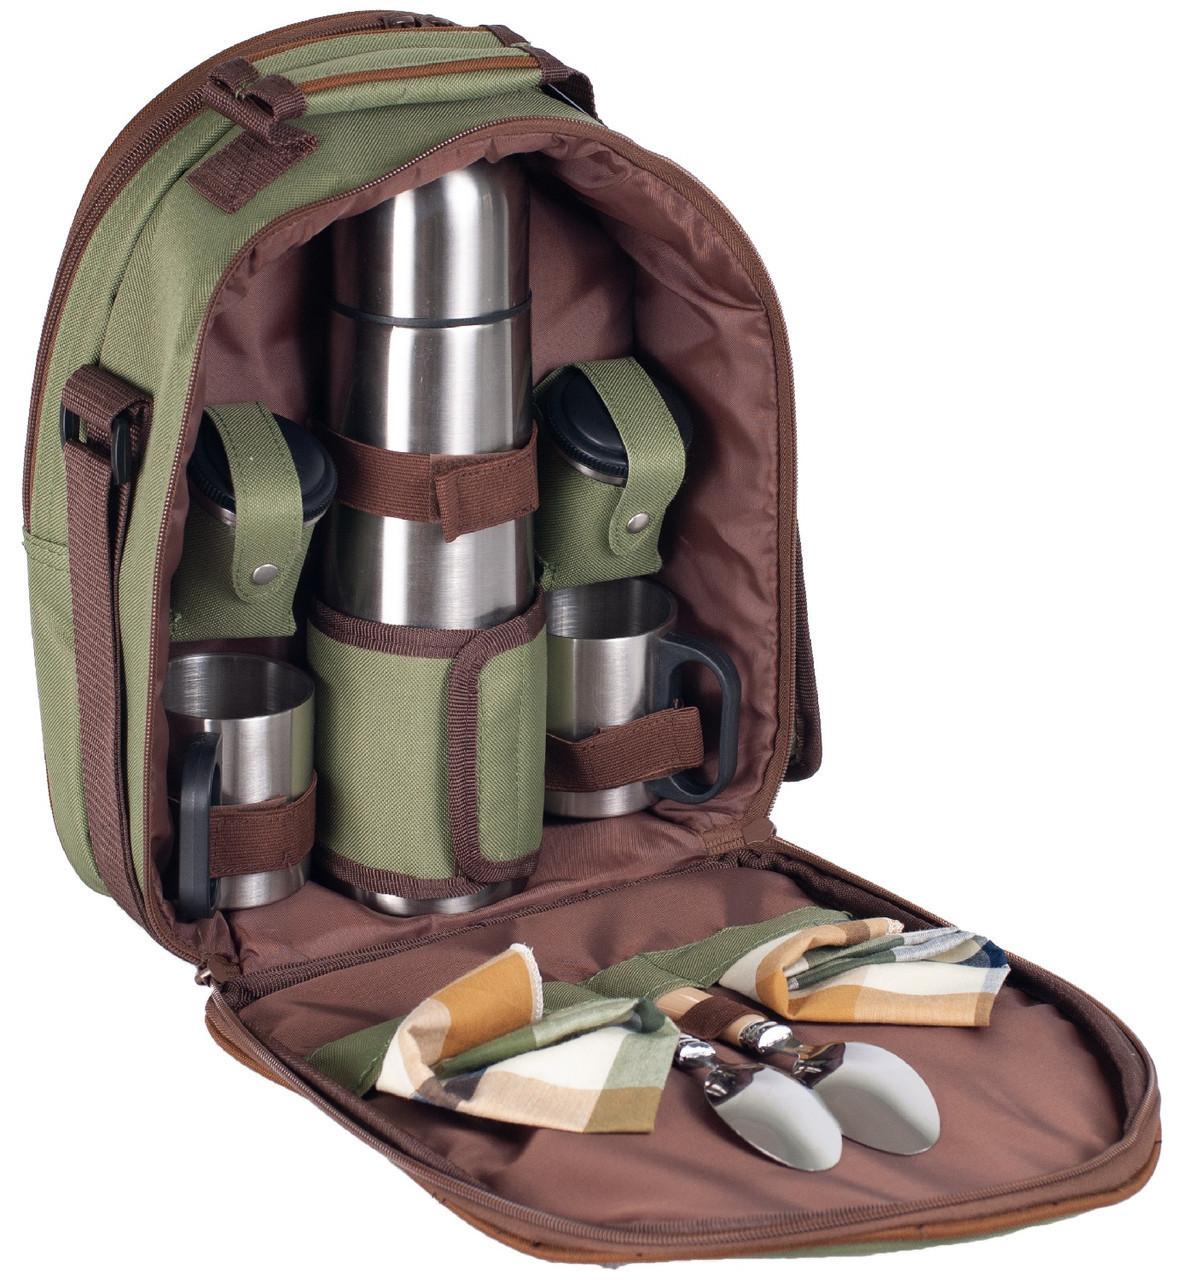 Набор для пикника Ranger Compact HB2-350 2225 RA 9908